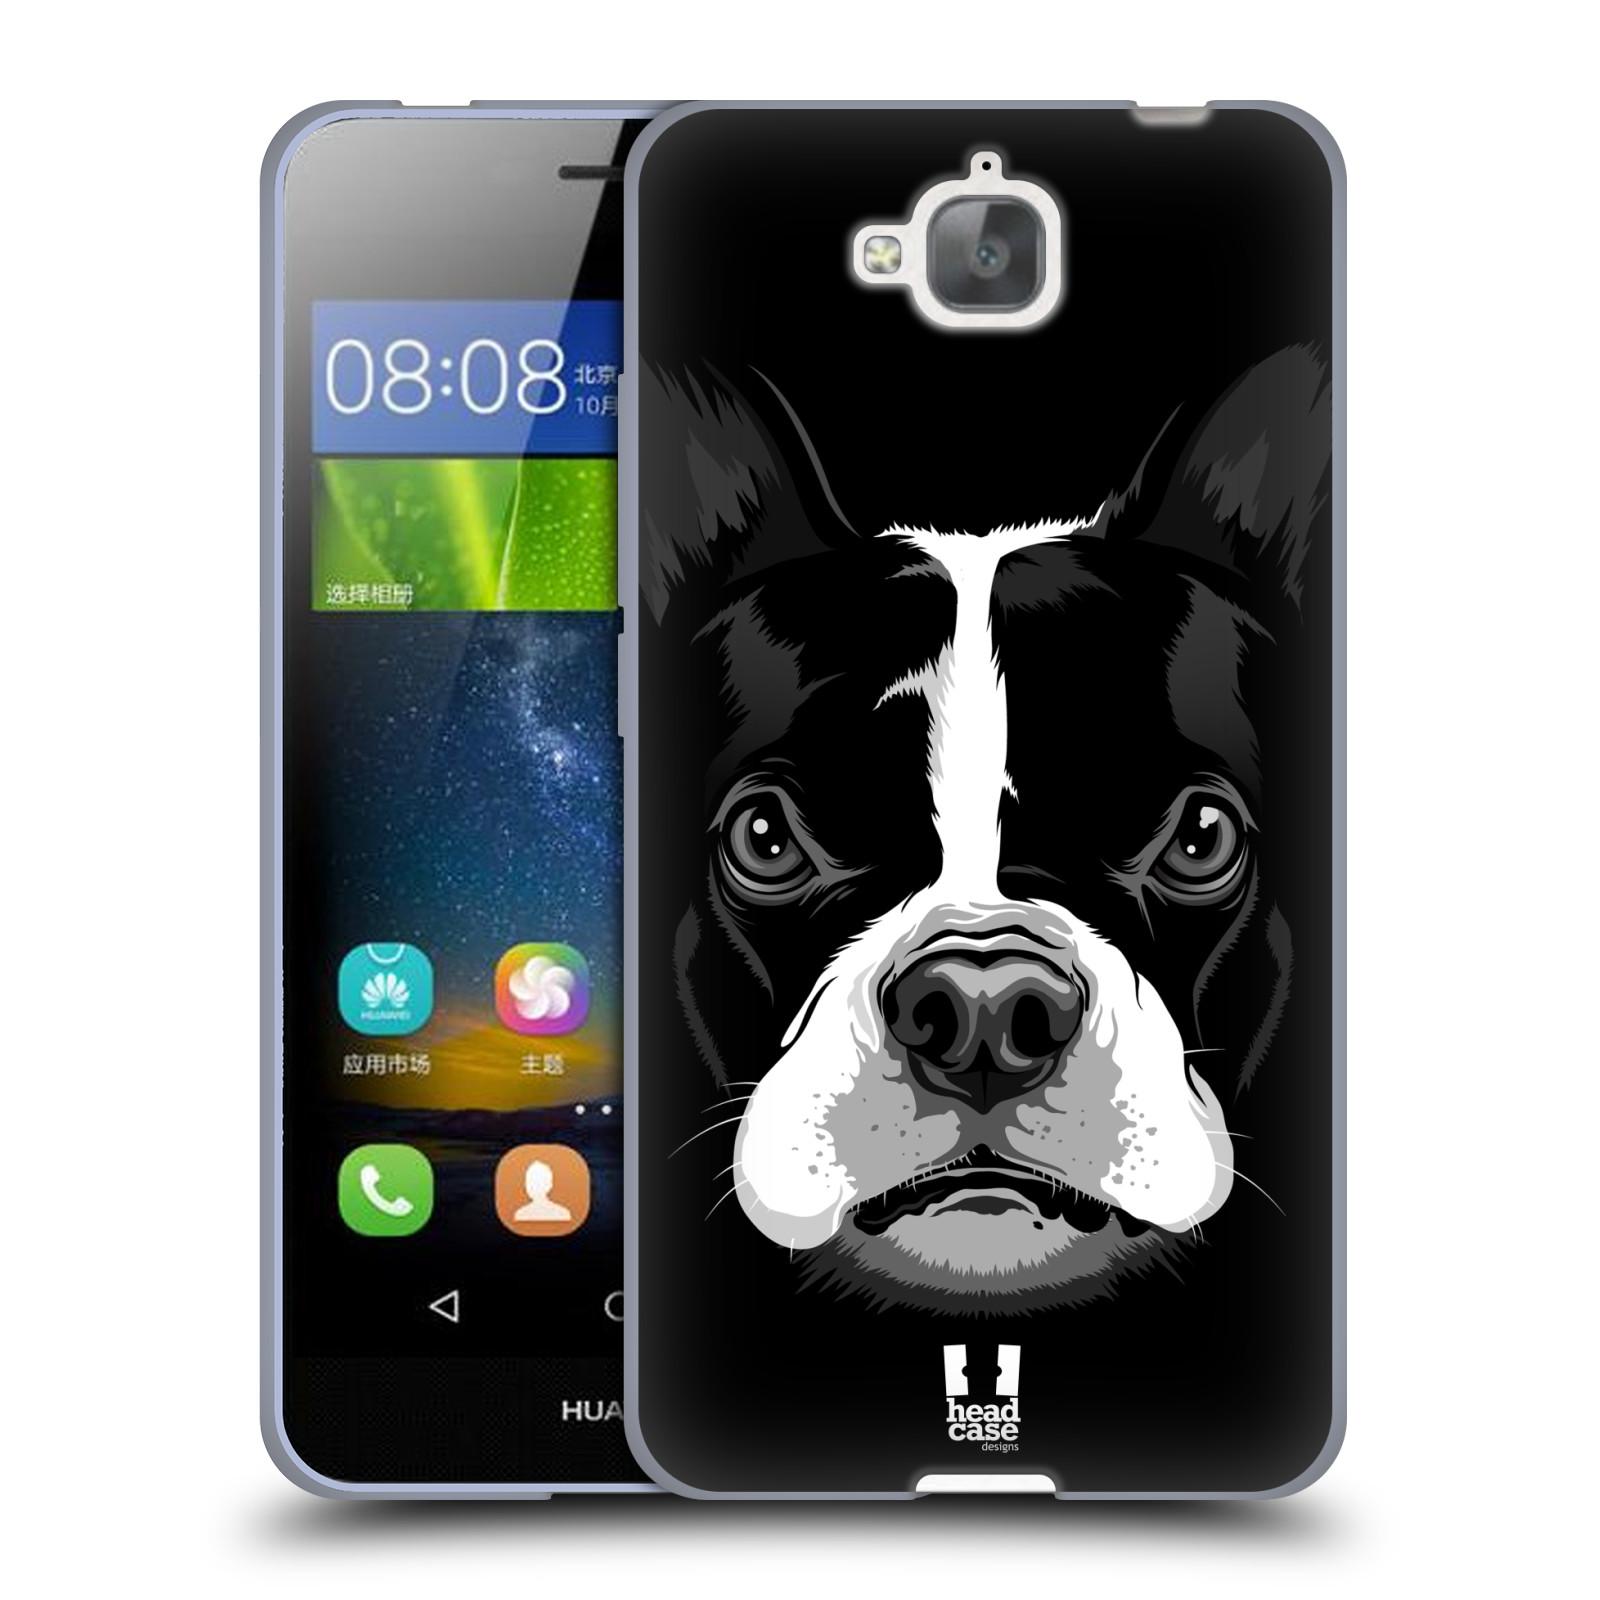 Silikonové pouzdro na mobil Huawei Y6 Pro Dual Sim HEAD CASE ILUSTROVANÝ BULDOČEK